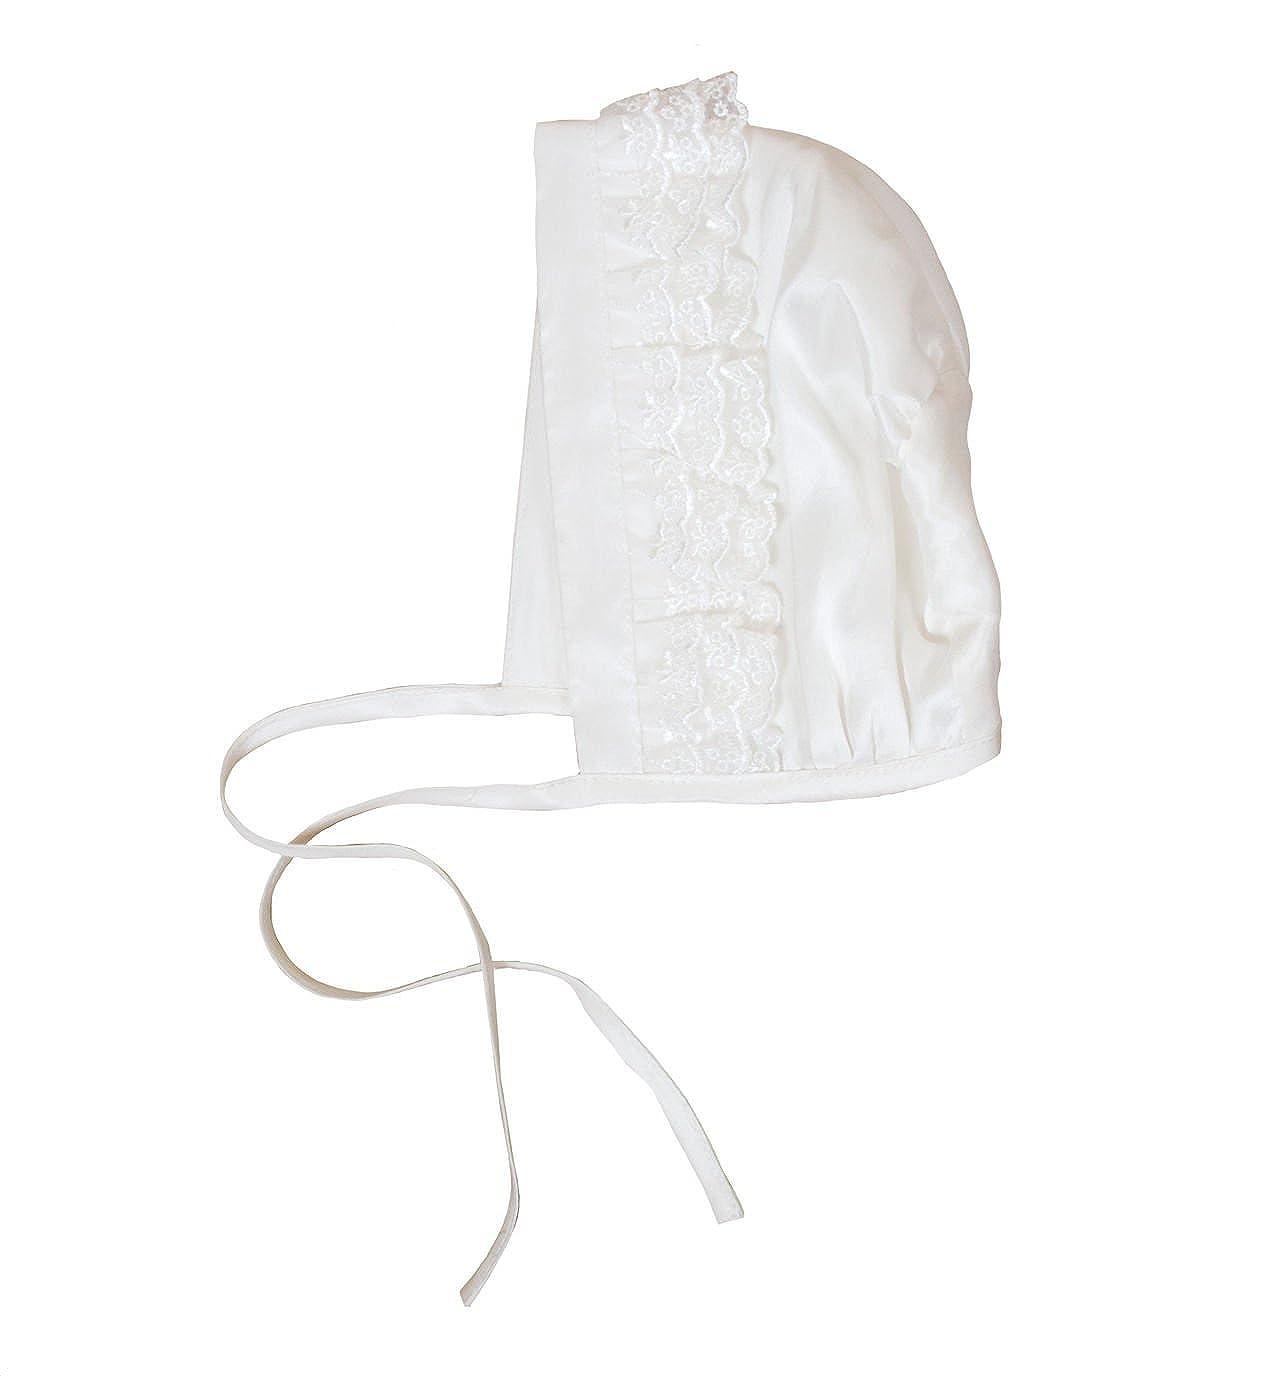 Heritage 'Zeynah' SILK Bonnet